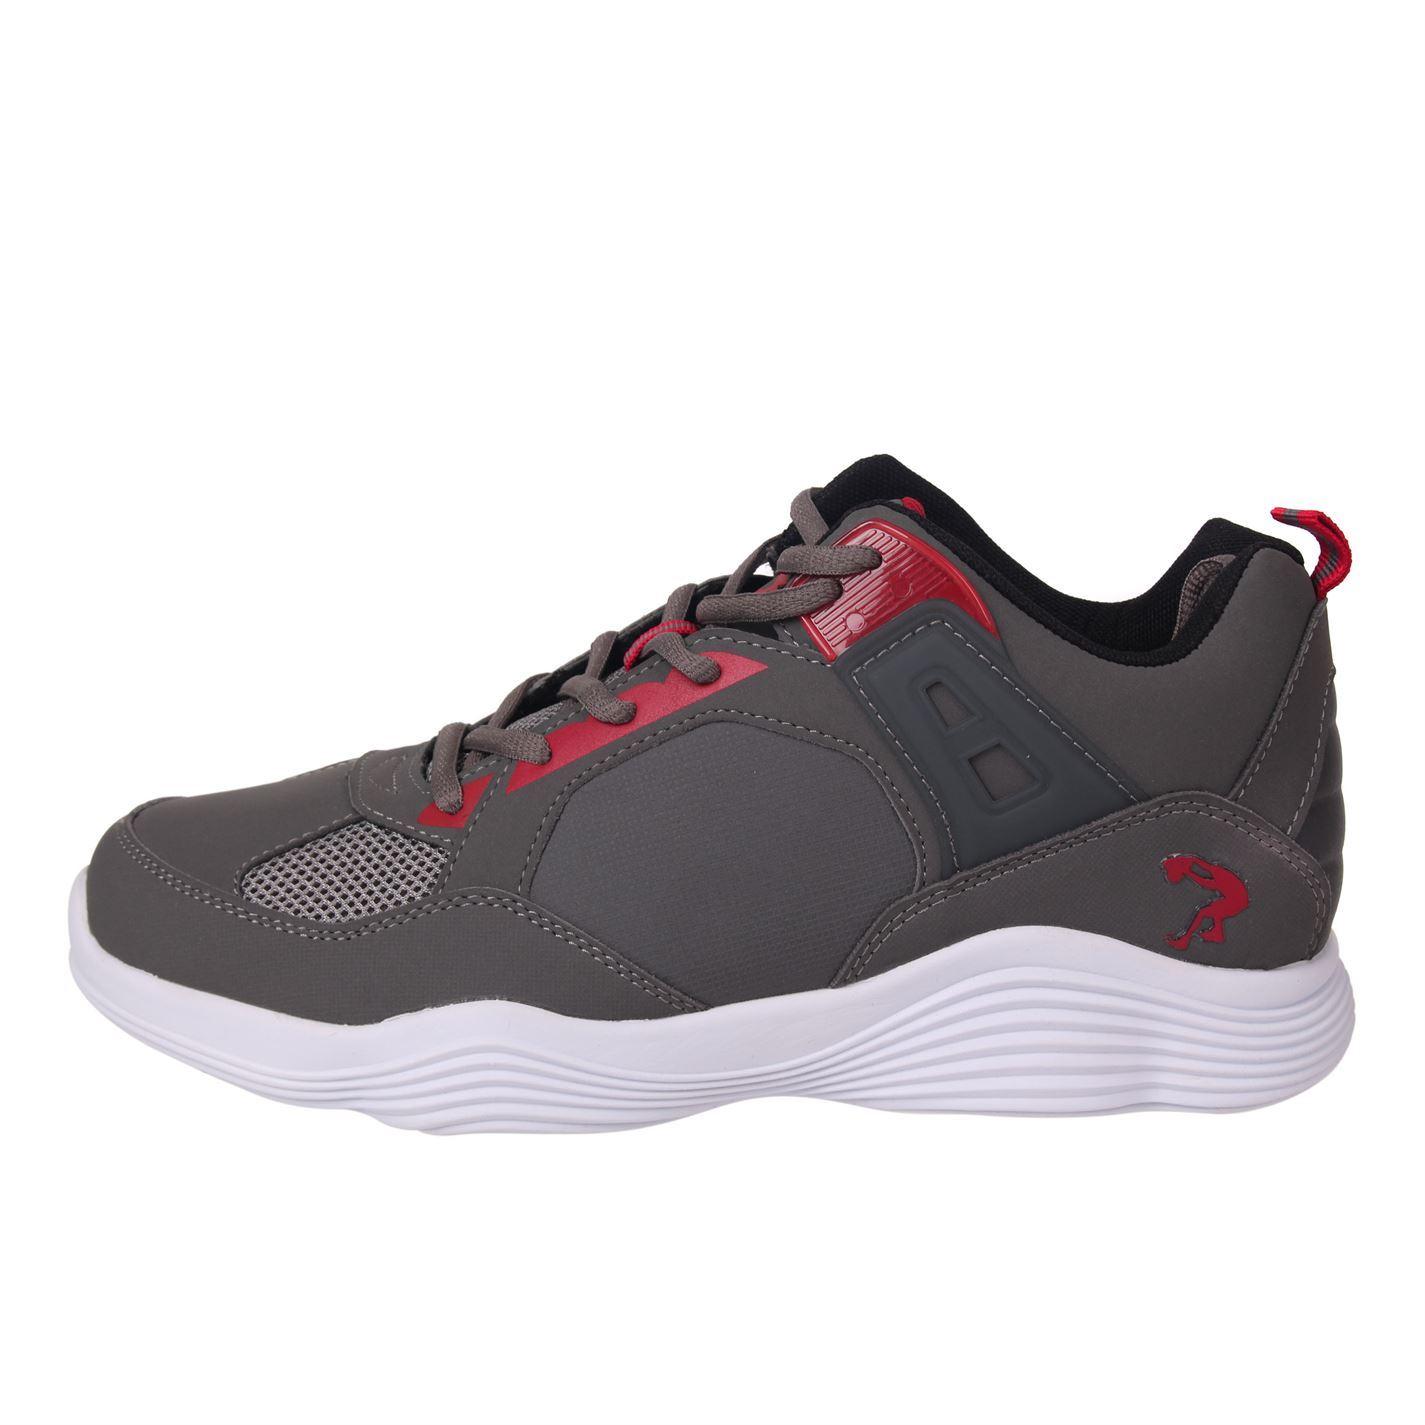 cheaper 5b723 77d45 SHAQ-Diversion-Basketball-Shoes-Mens-Trainers-Sneakers-Footwear thumbnail